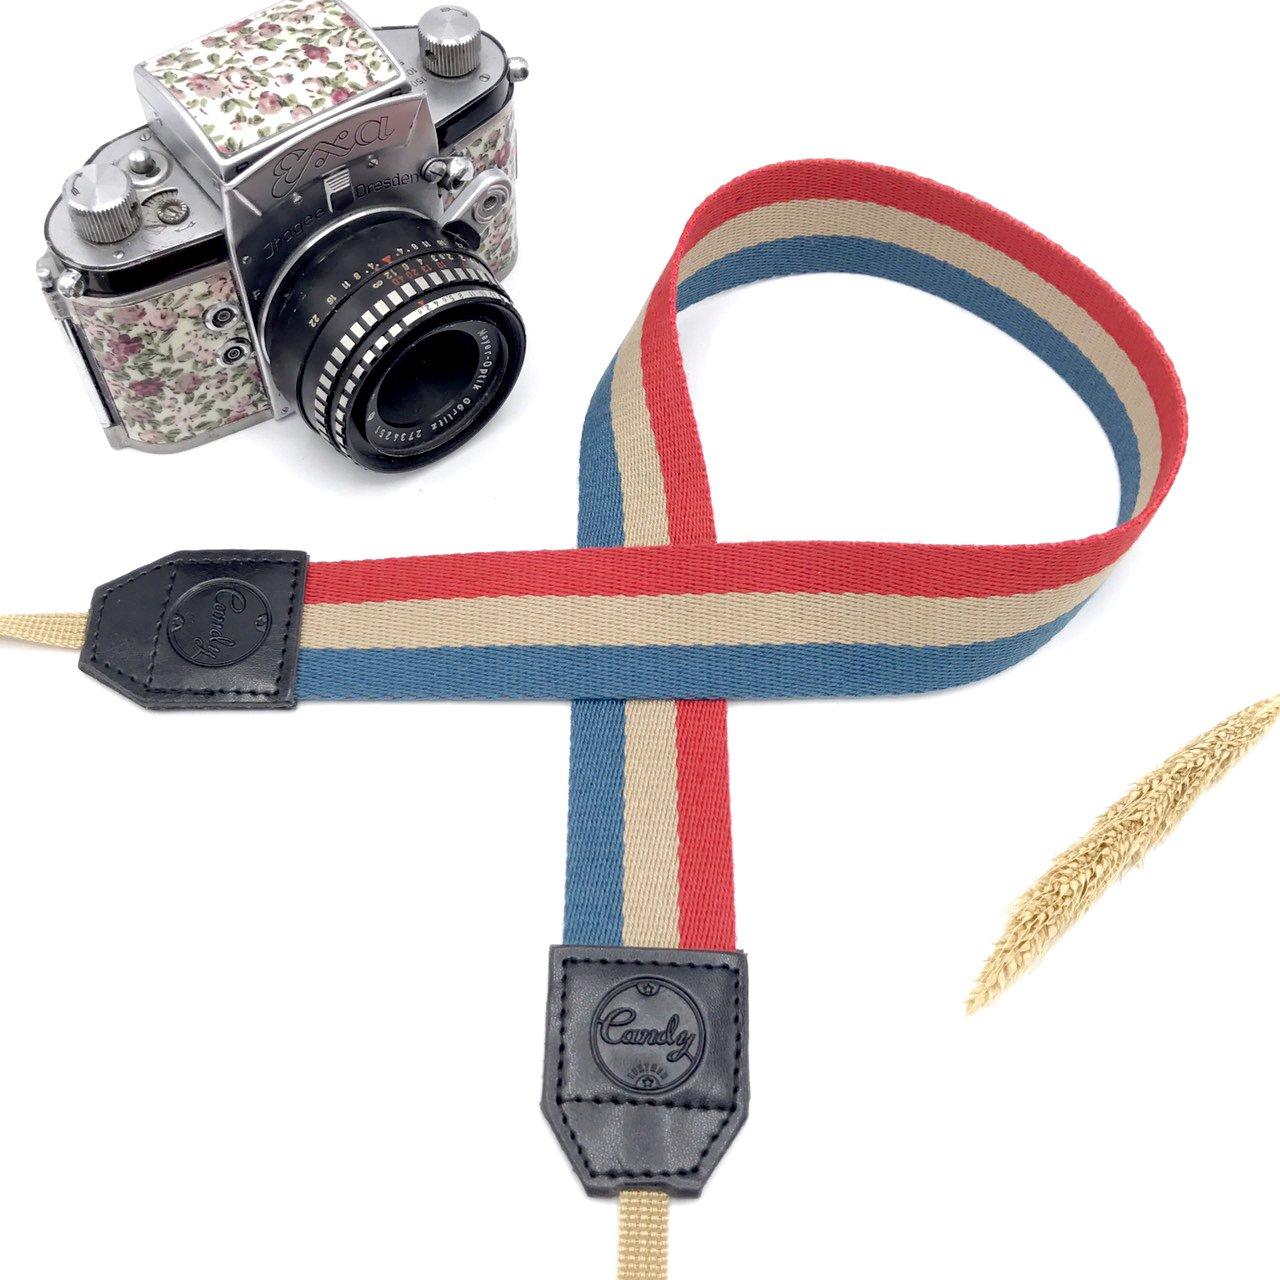 Presonalizedネイビーベージュレッドカメラストラップ、キャンディレザーDSLRカメラストラップ、本革カメラストラップ、ギフトfor Her B07DKG73DX